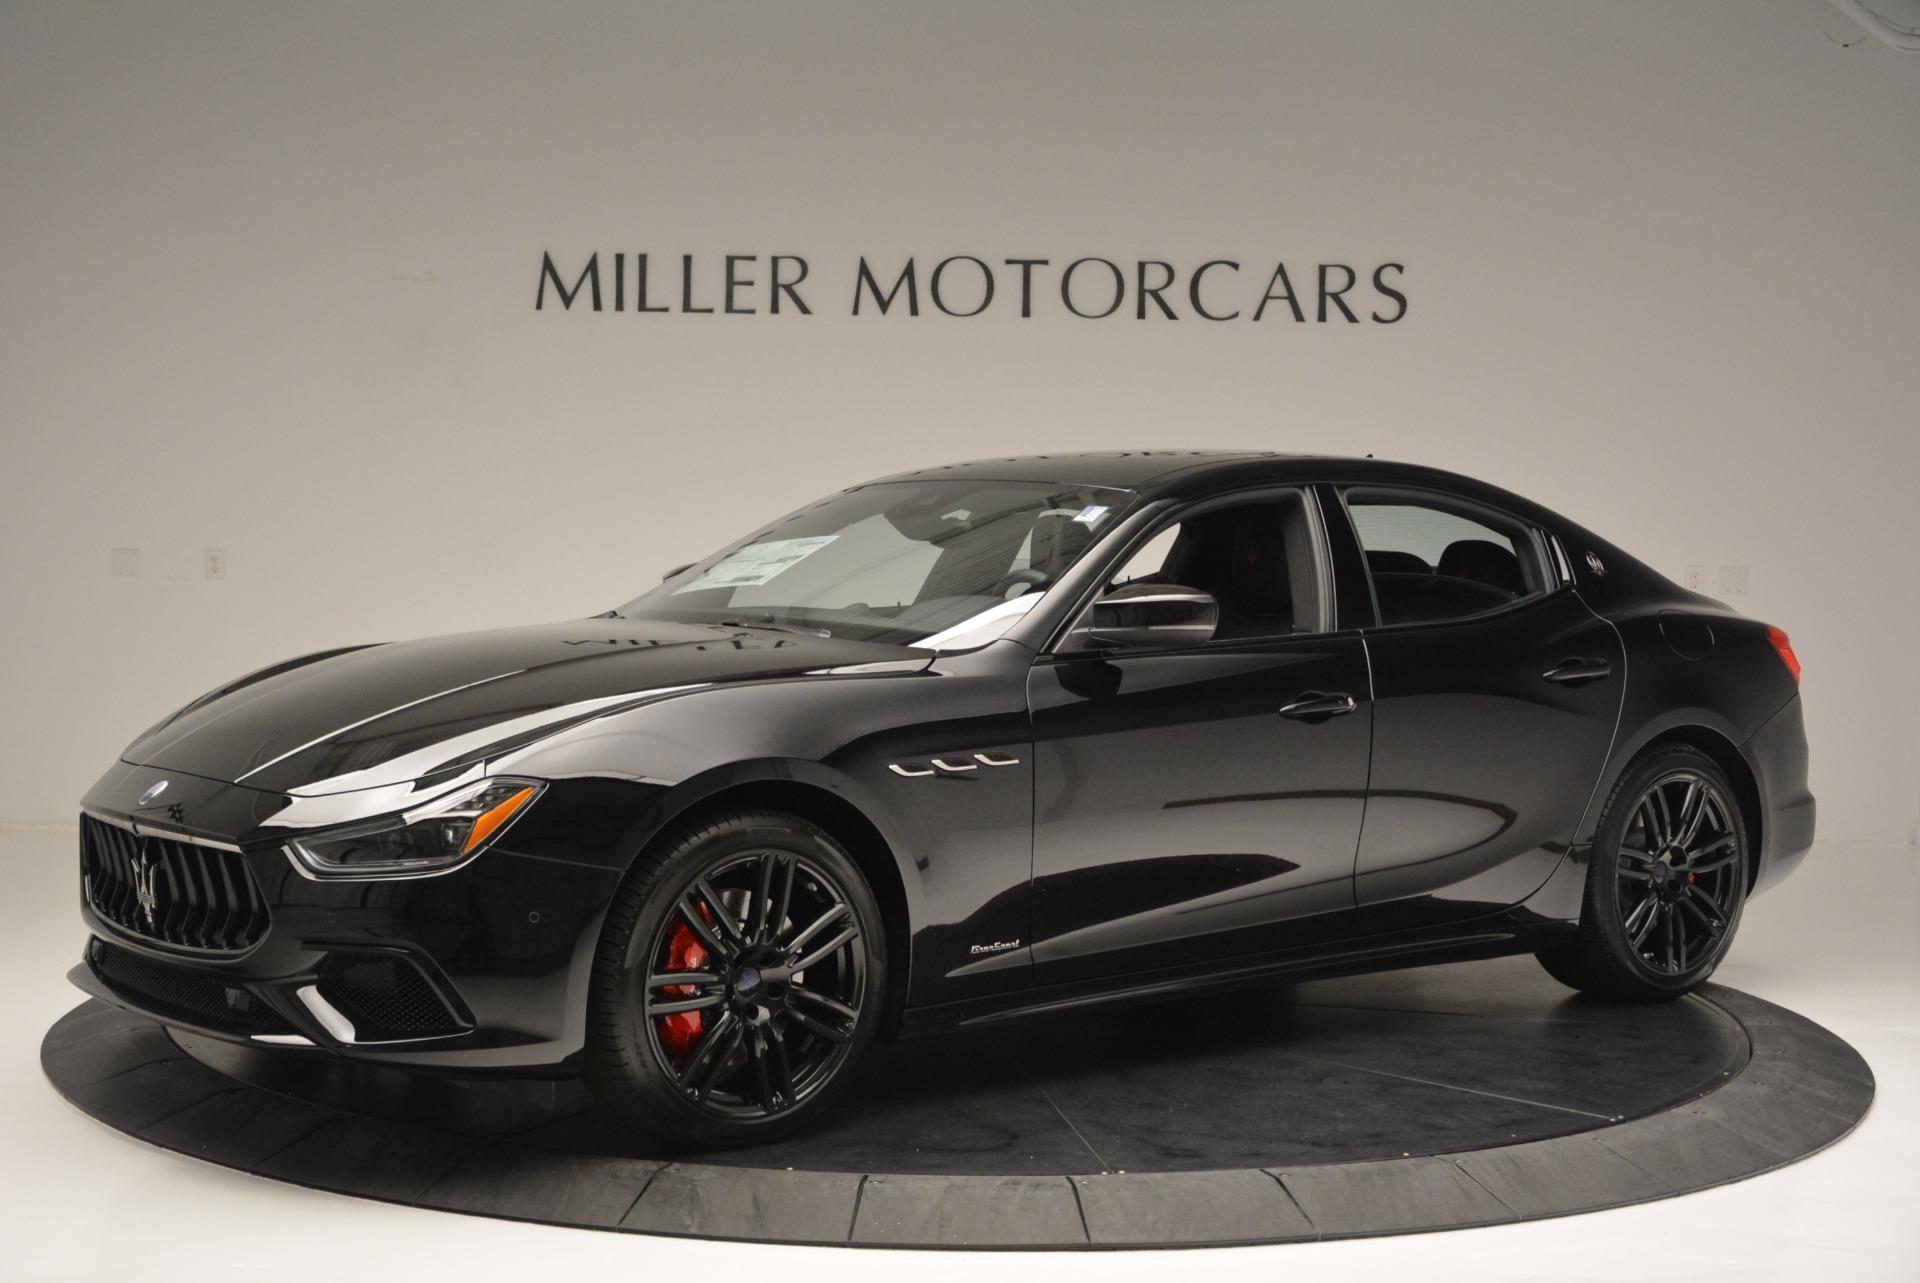 New 2018 Maserati Ghibli SQ4 GranSport Nerissimo For Sale In Westport, CT 2278_p2